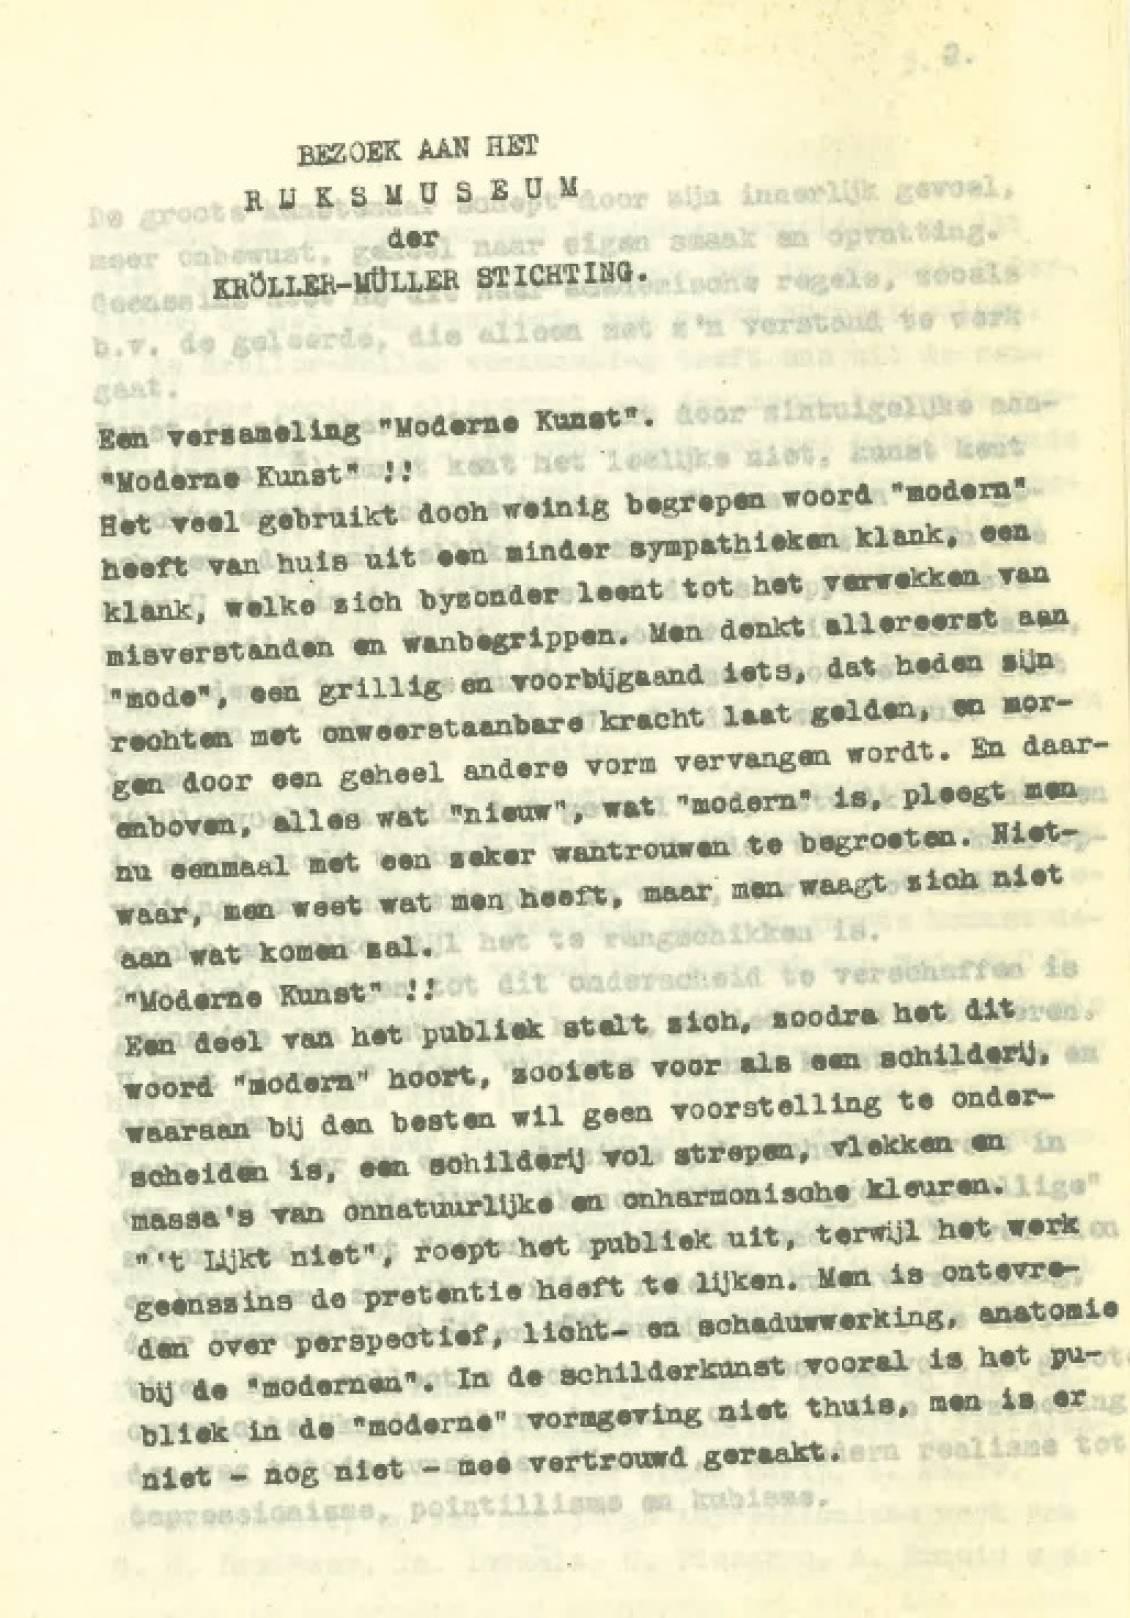 Willy Auping, Opstel over de collectie van Sichting Kröller-Müller, 9 juli 1937